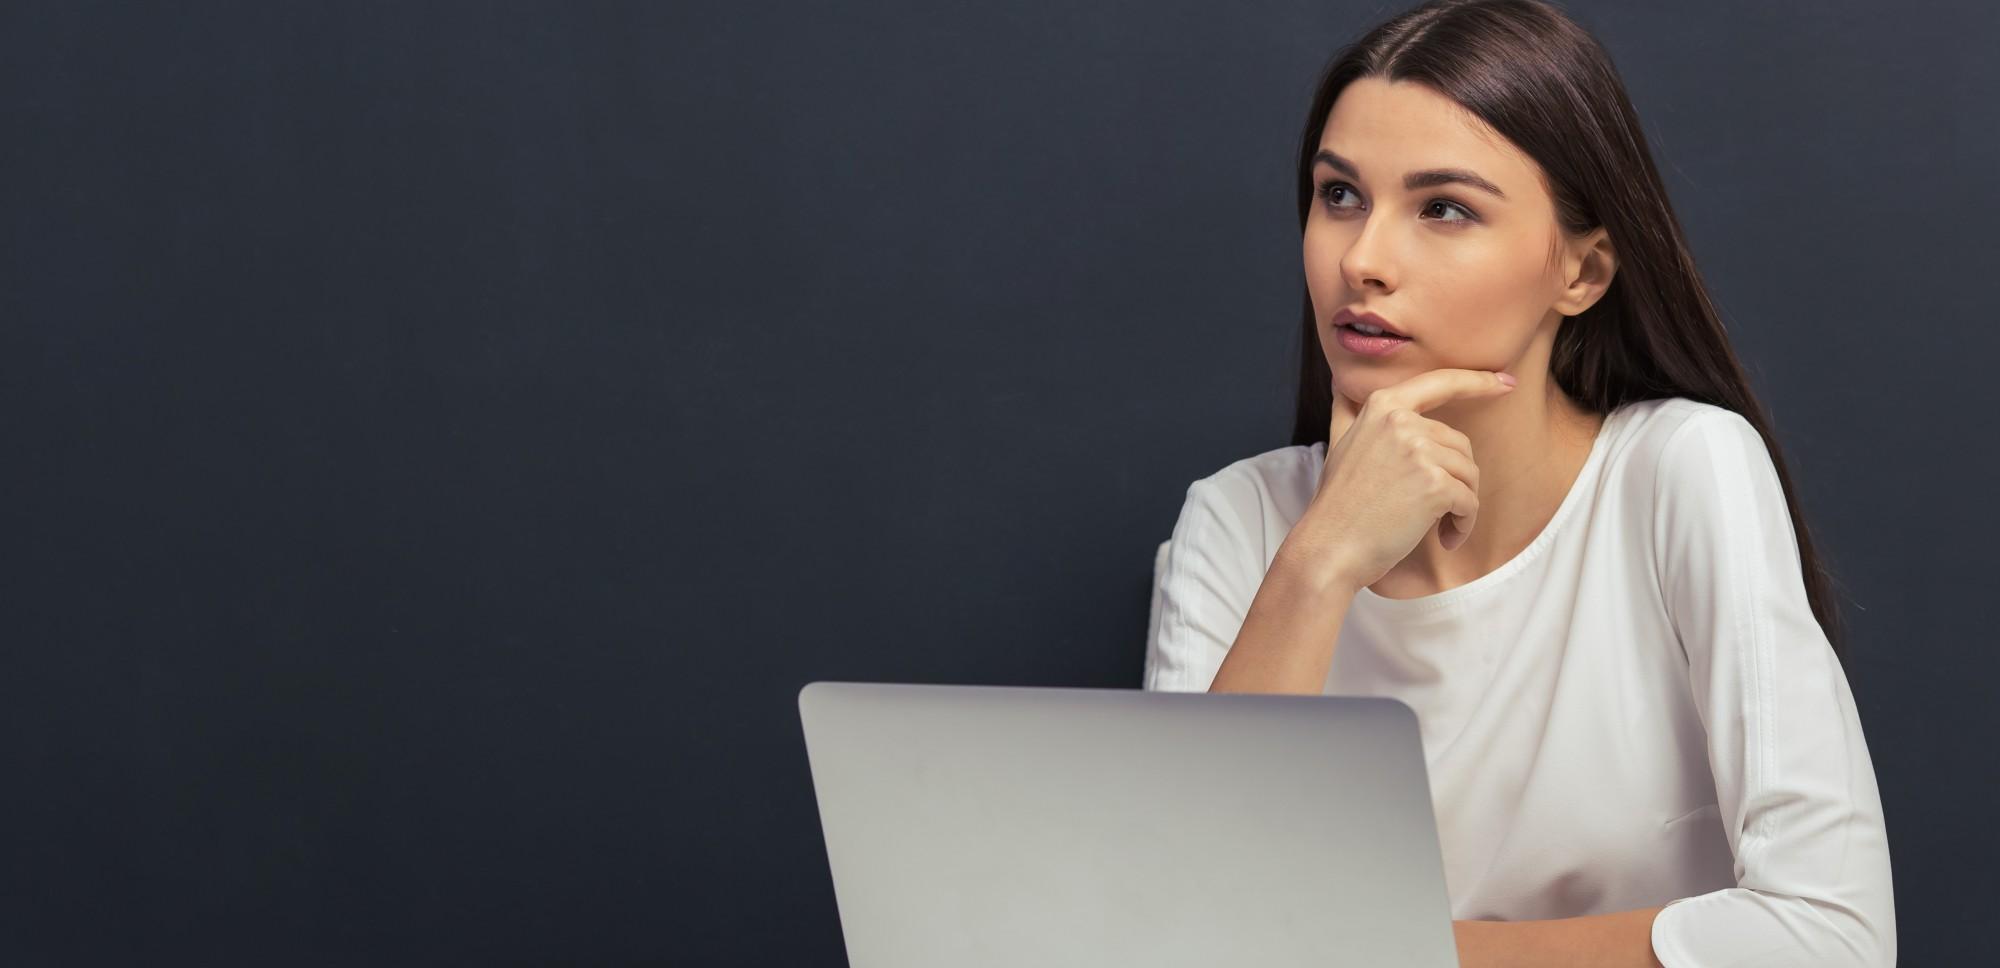 LinkedIn profile for beginners